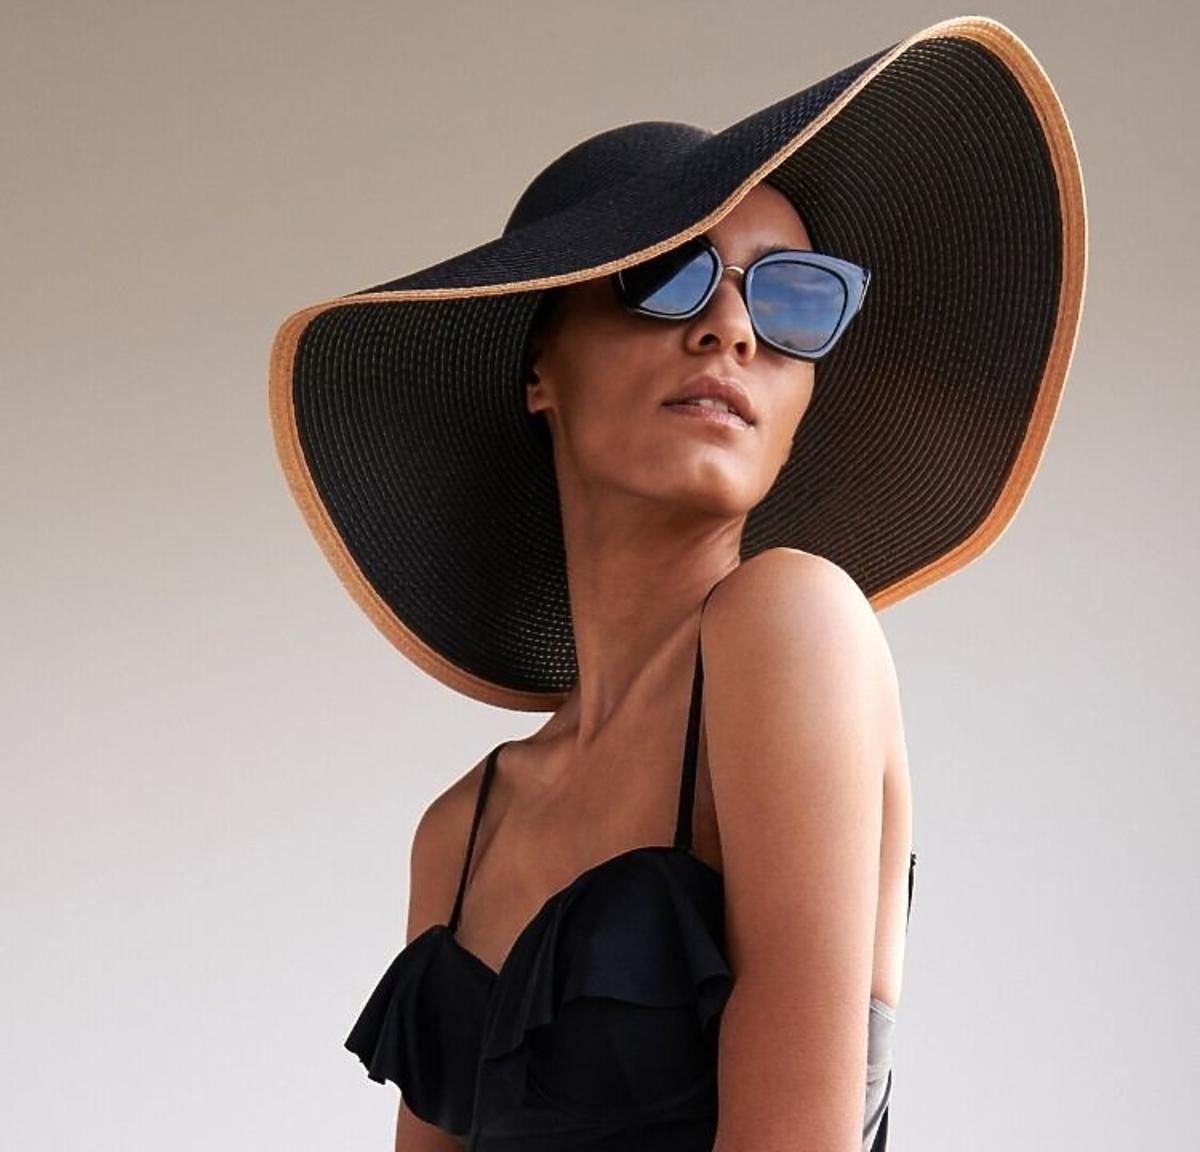 Słomkowy kapelusz z Reserved